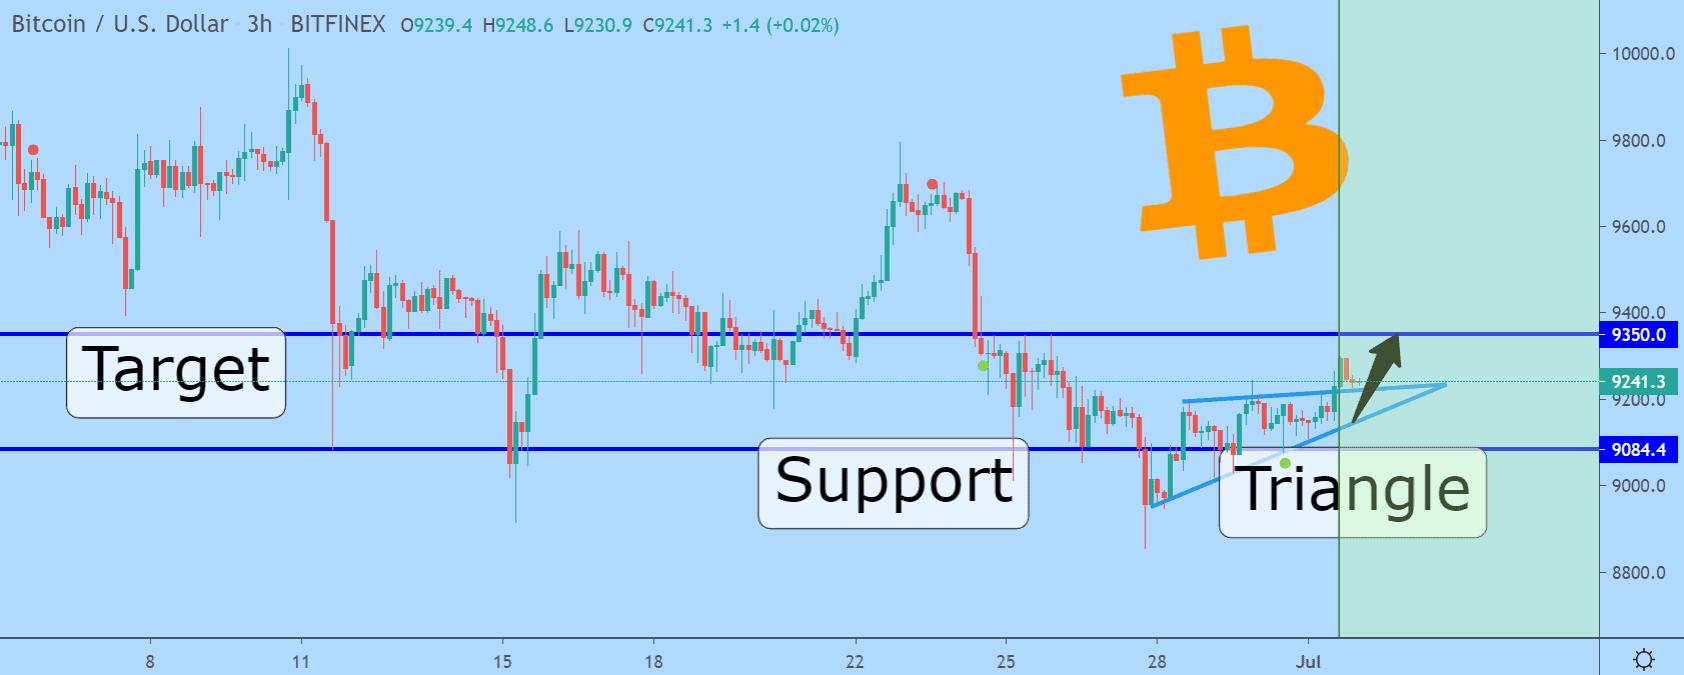 Bitcoin price chart 3 - 1 July